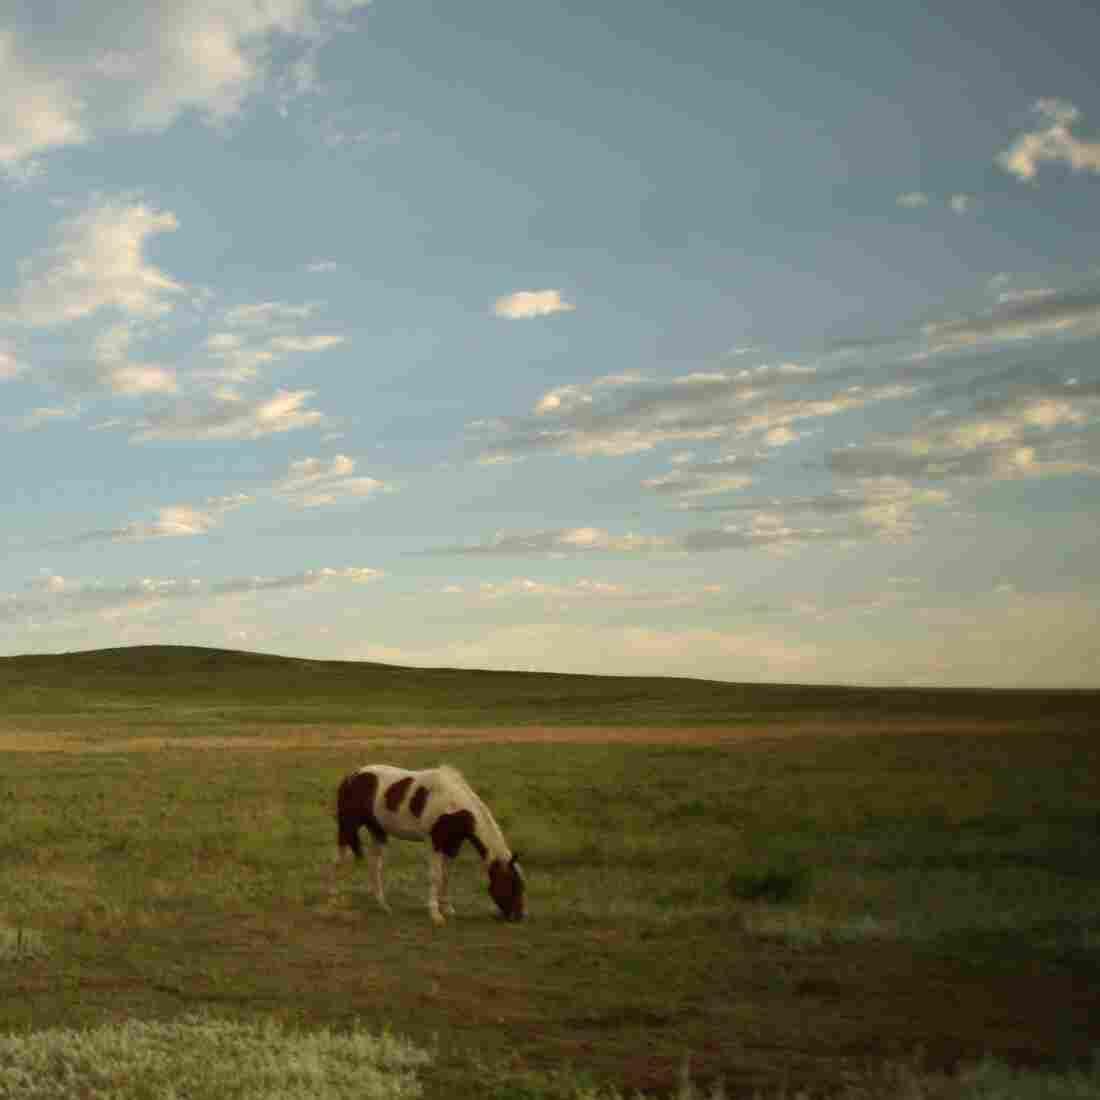 S. Dakota Indian Foster Care 1: Investigative Storytelling Gone Awry